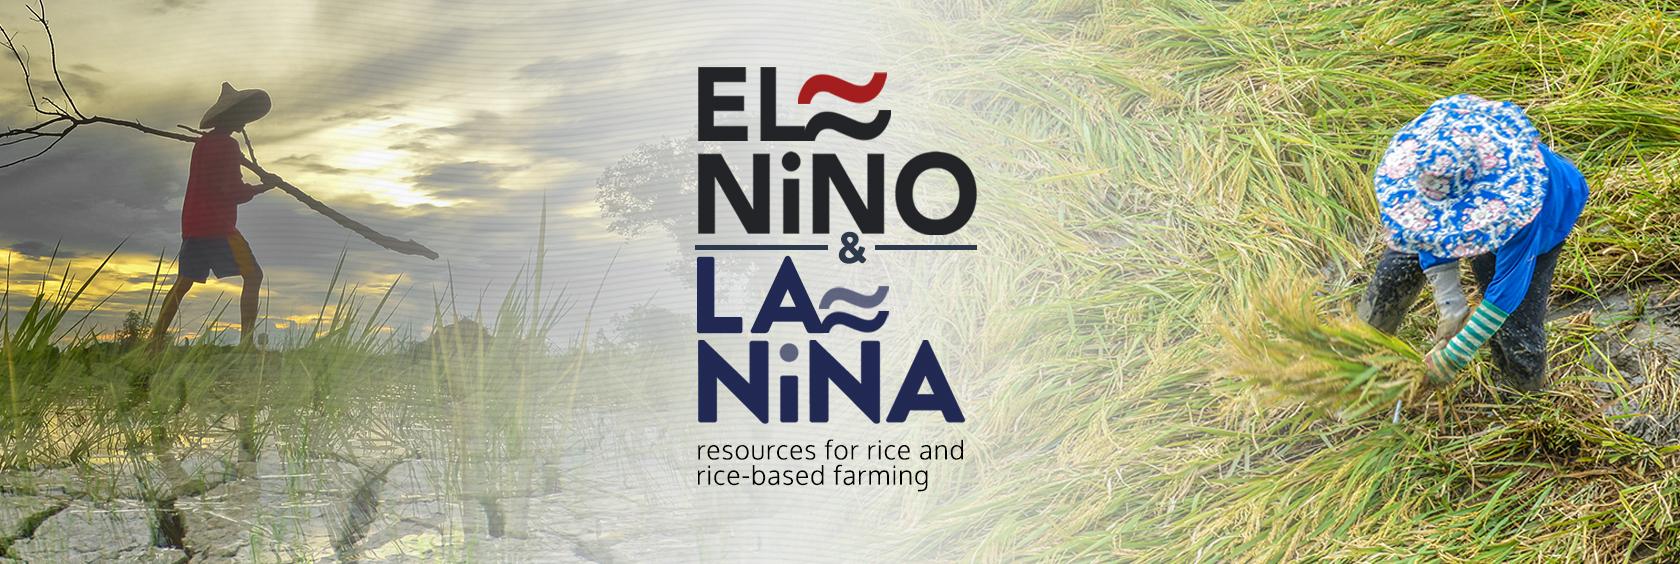 La nina El Nino